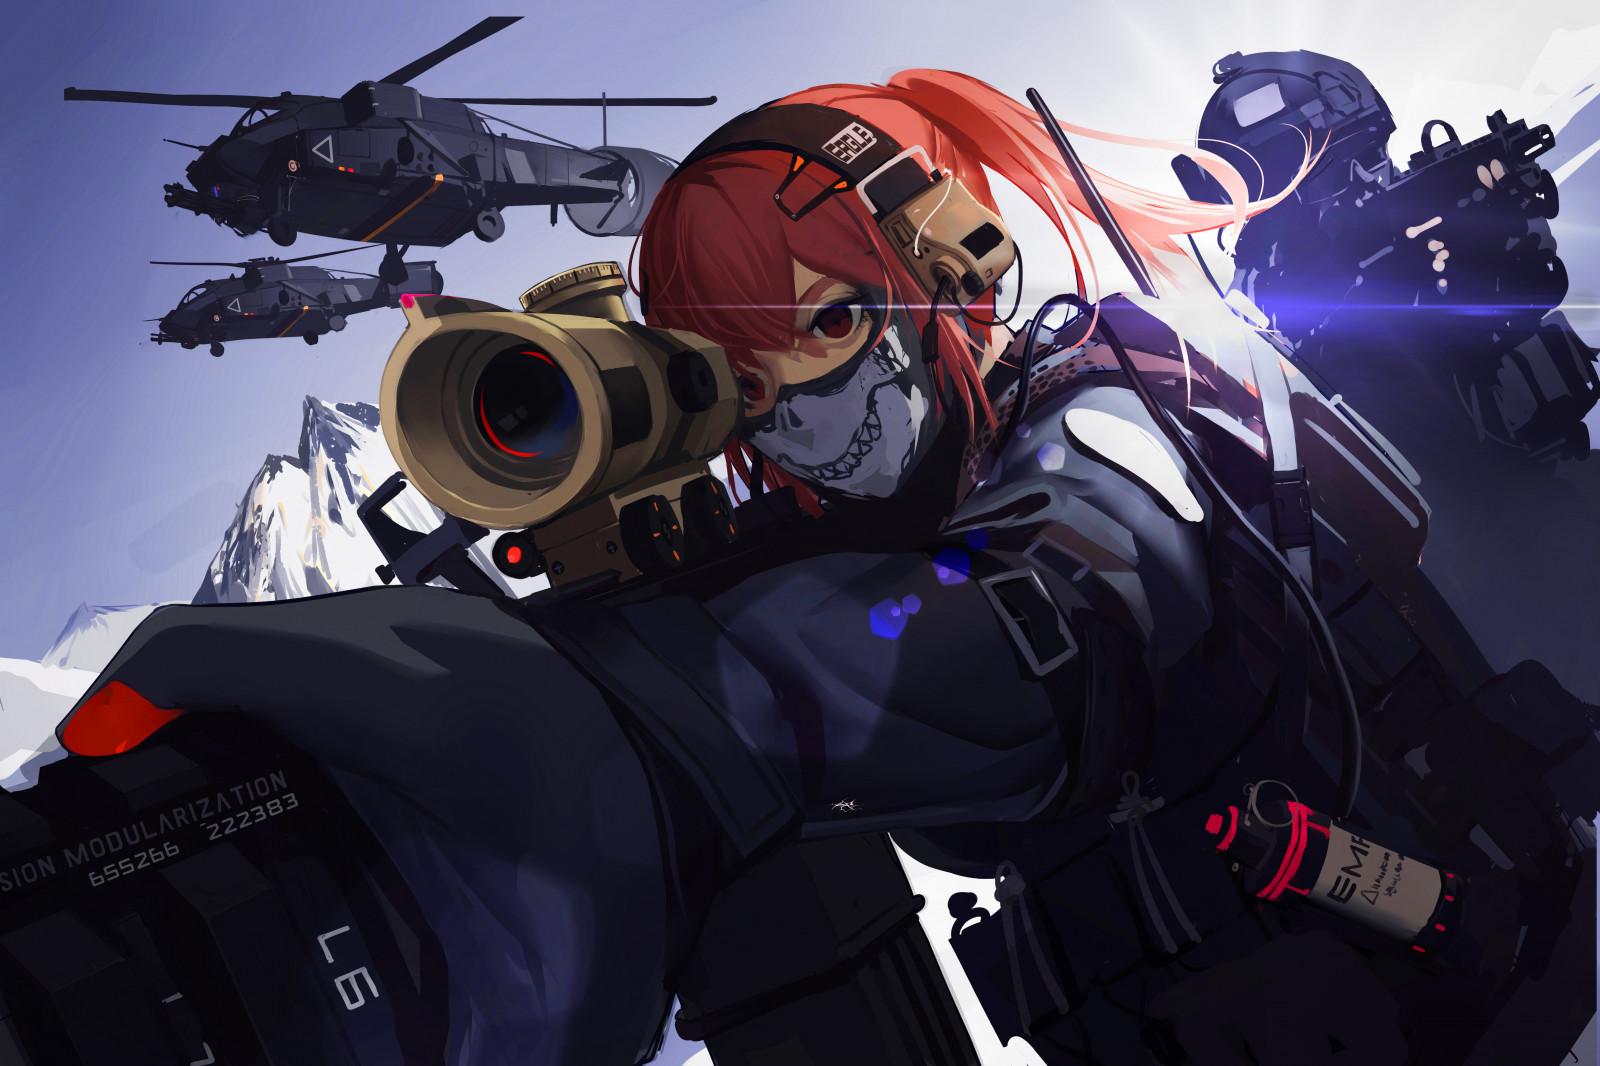 4k Girls Und Panzer Wallpaper Wallpaper Military China Weapon Soldier Anime Girls